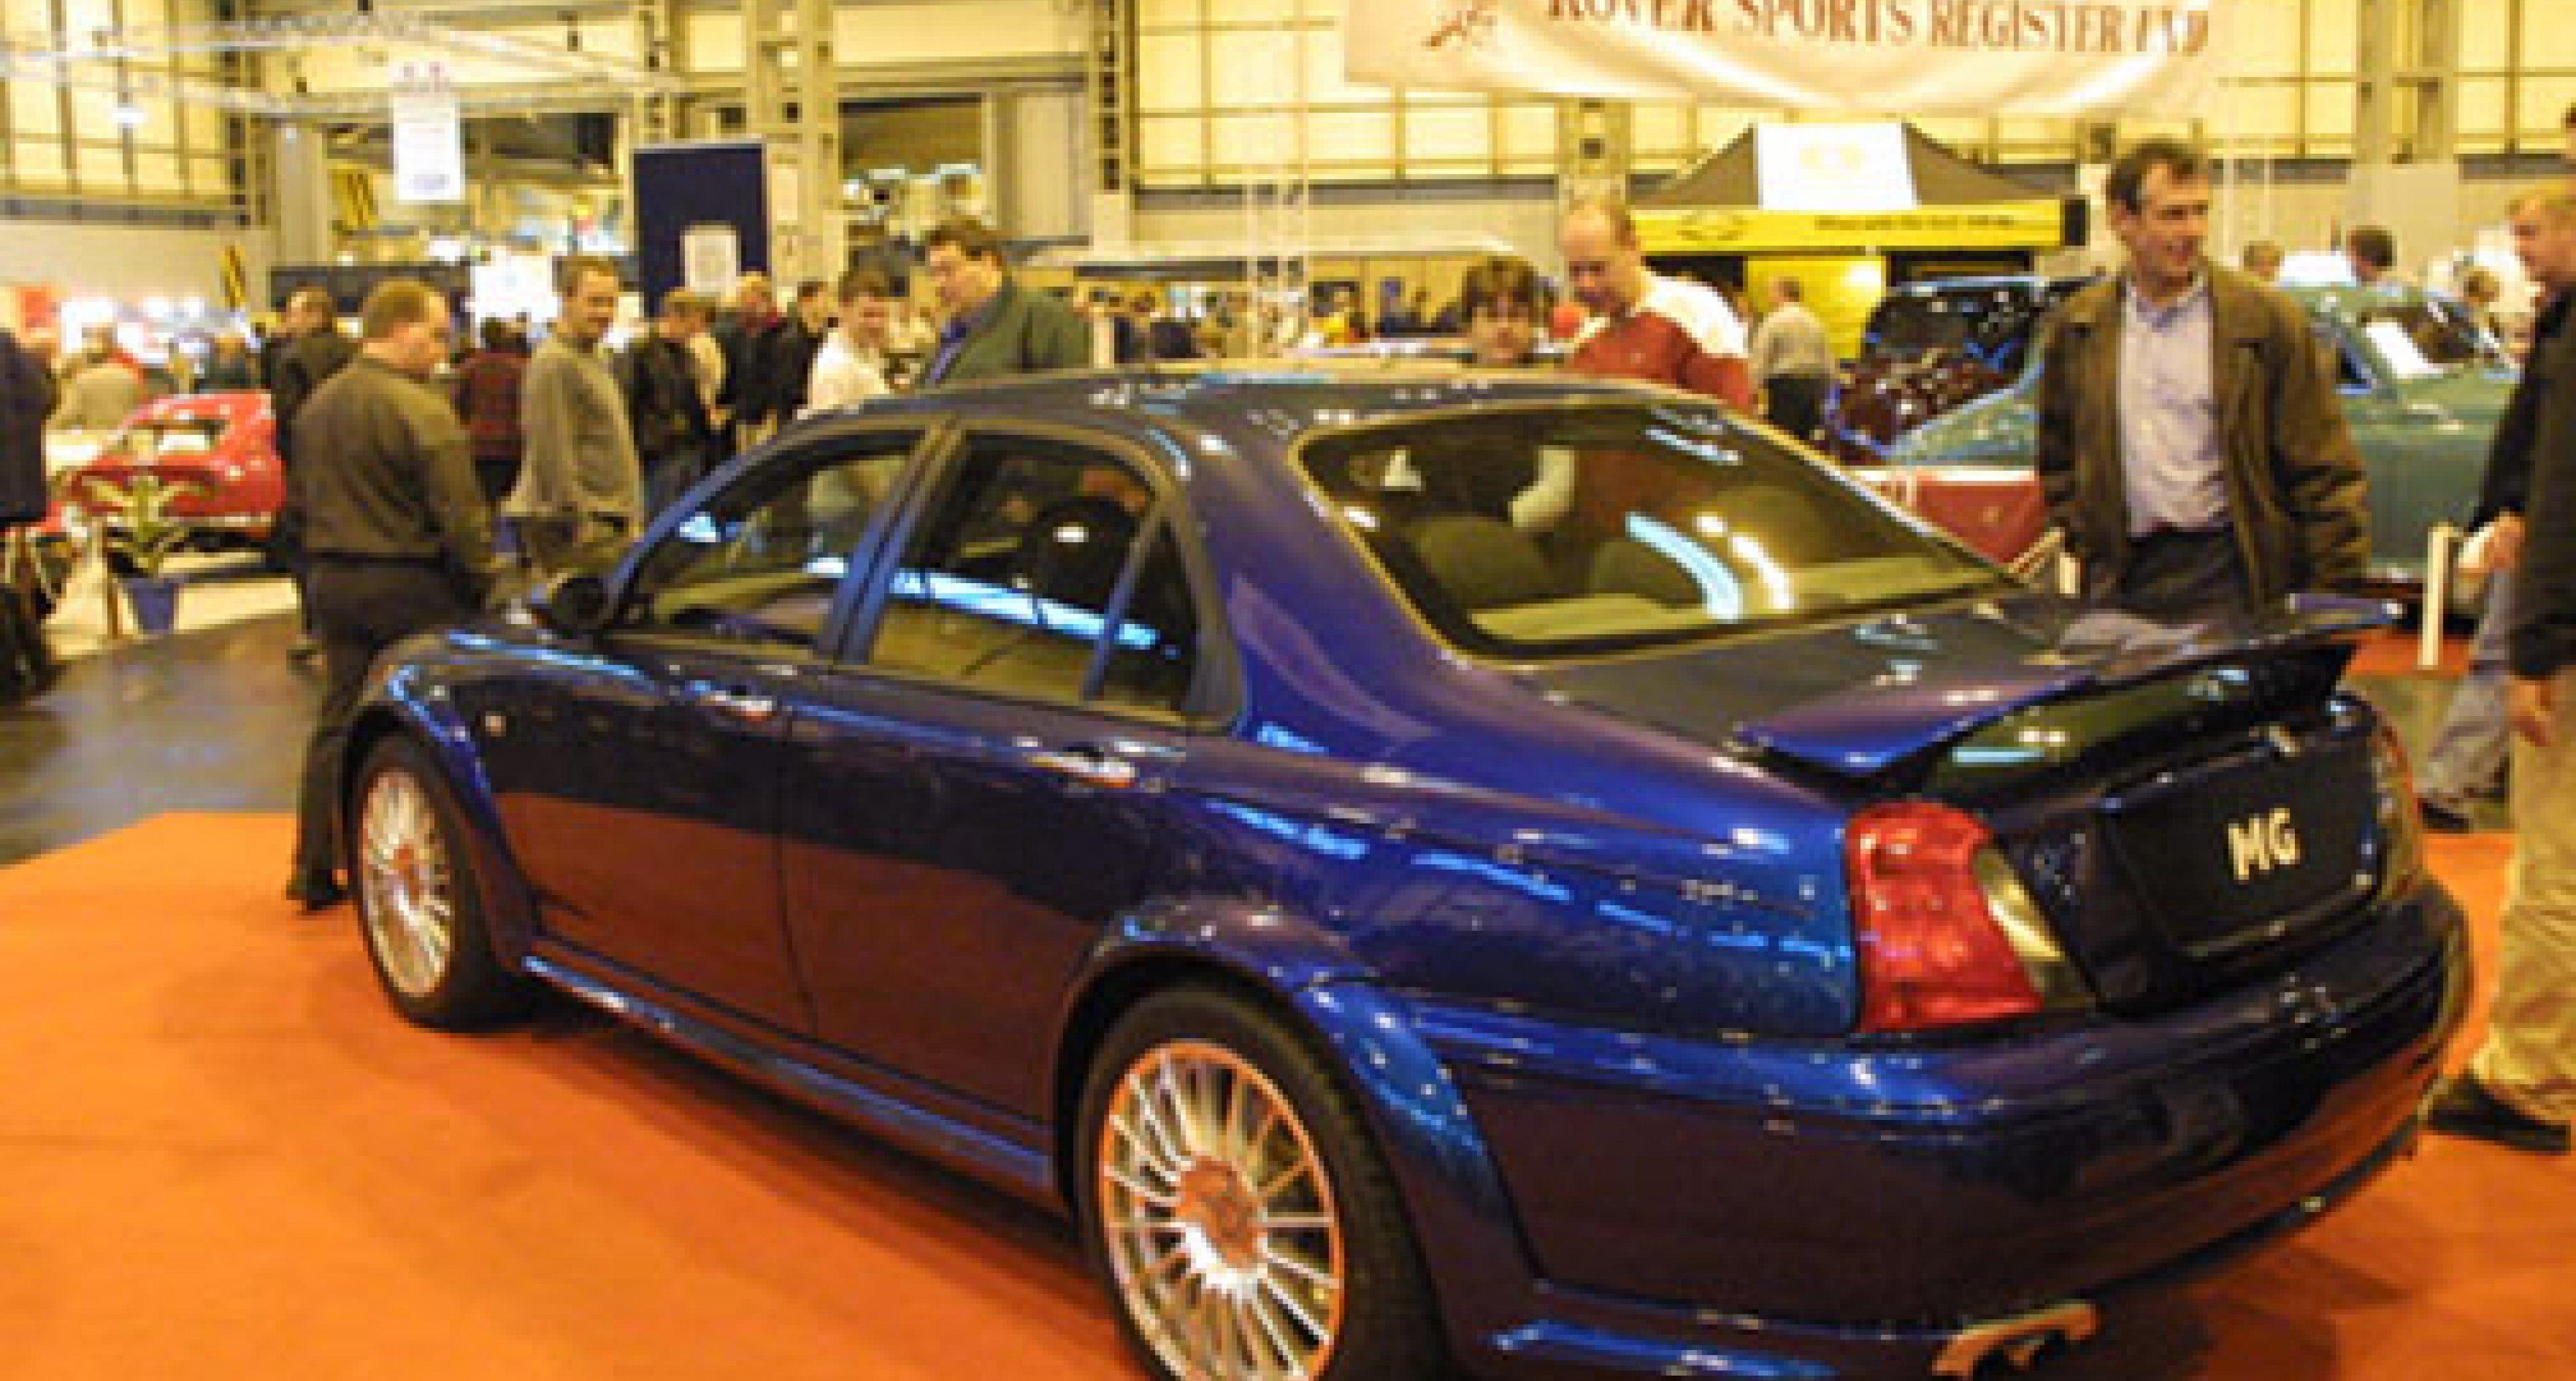 International Classic Car Show Birmingham UK 2001